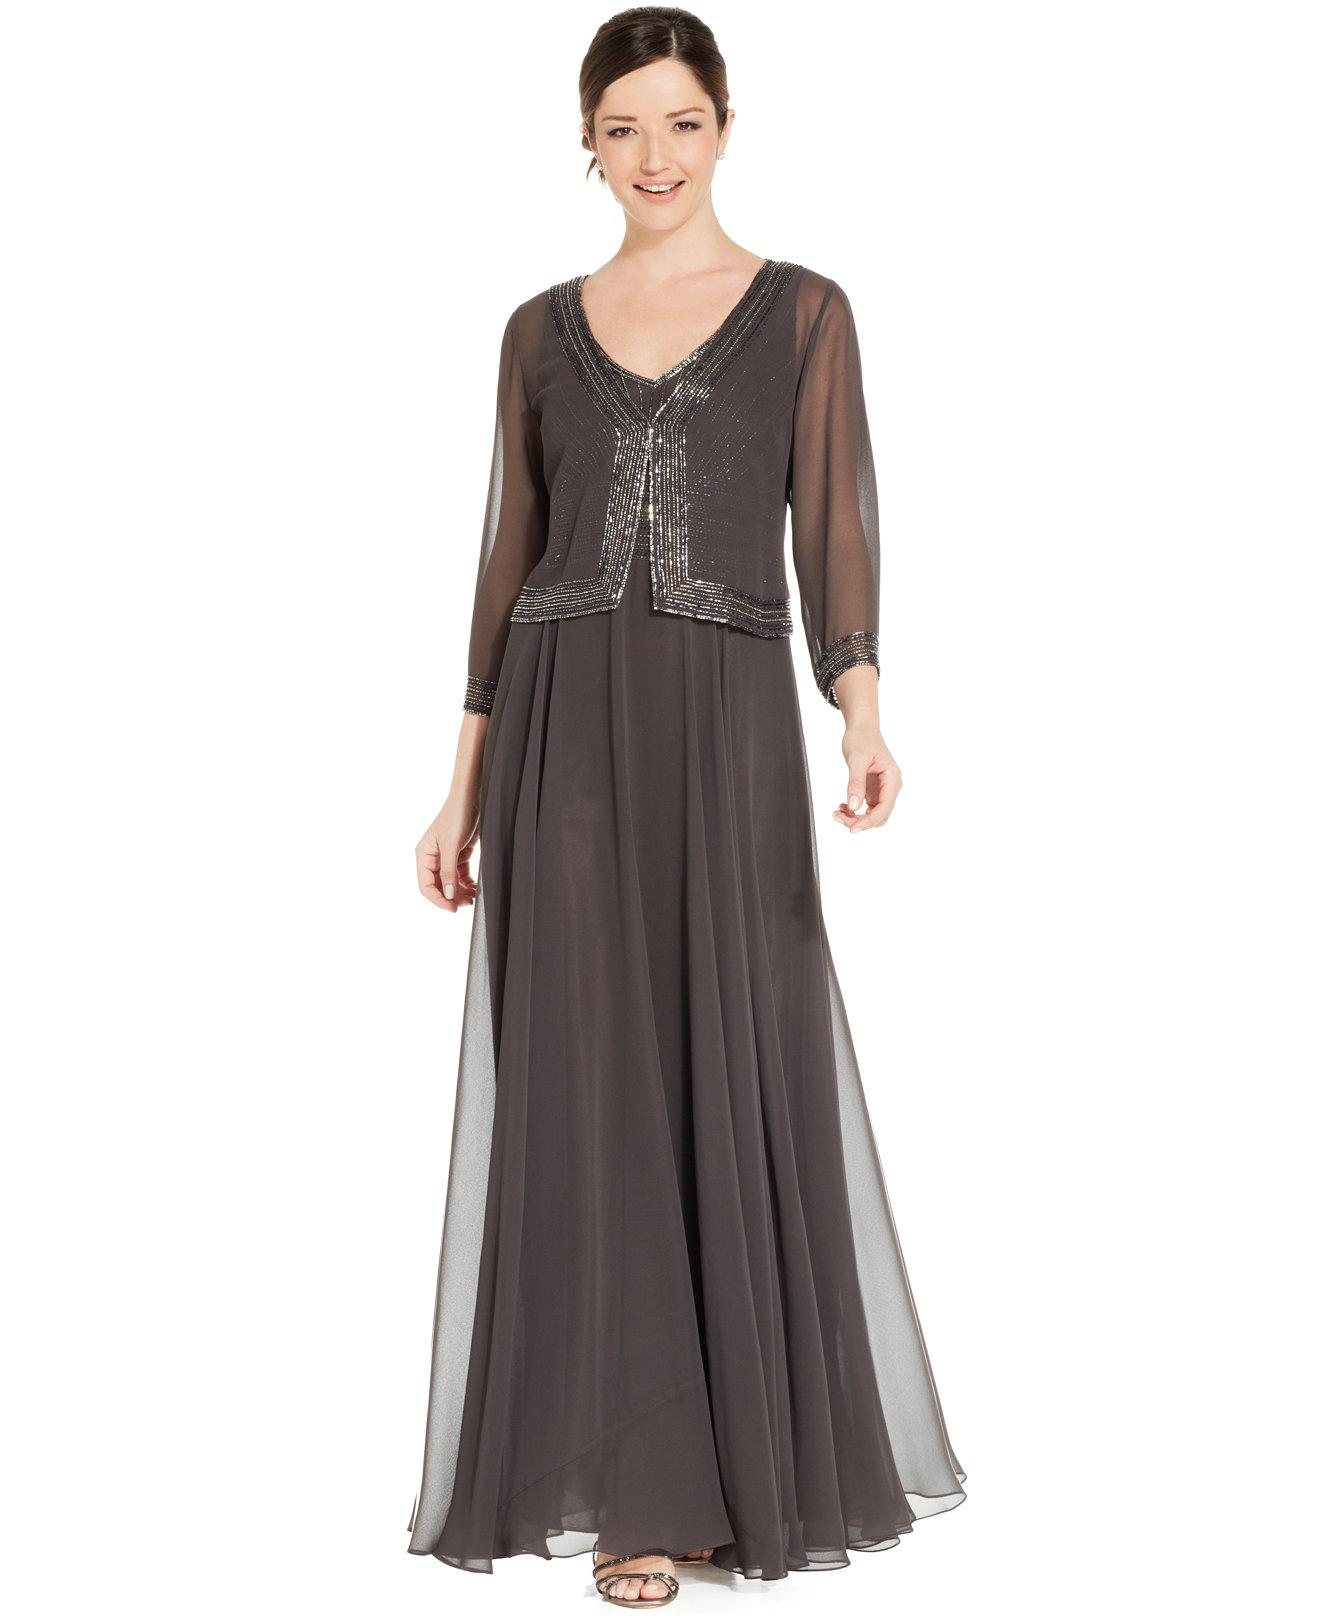 plus length attire queens new york